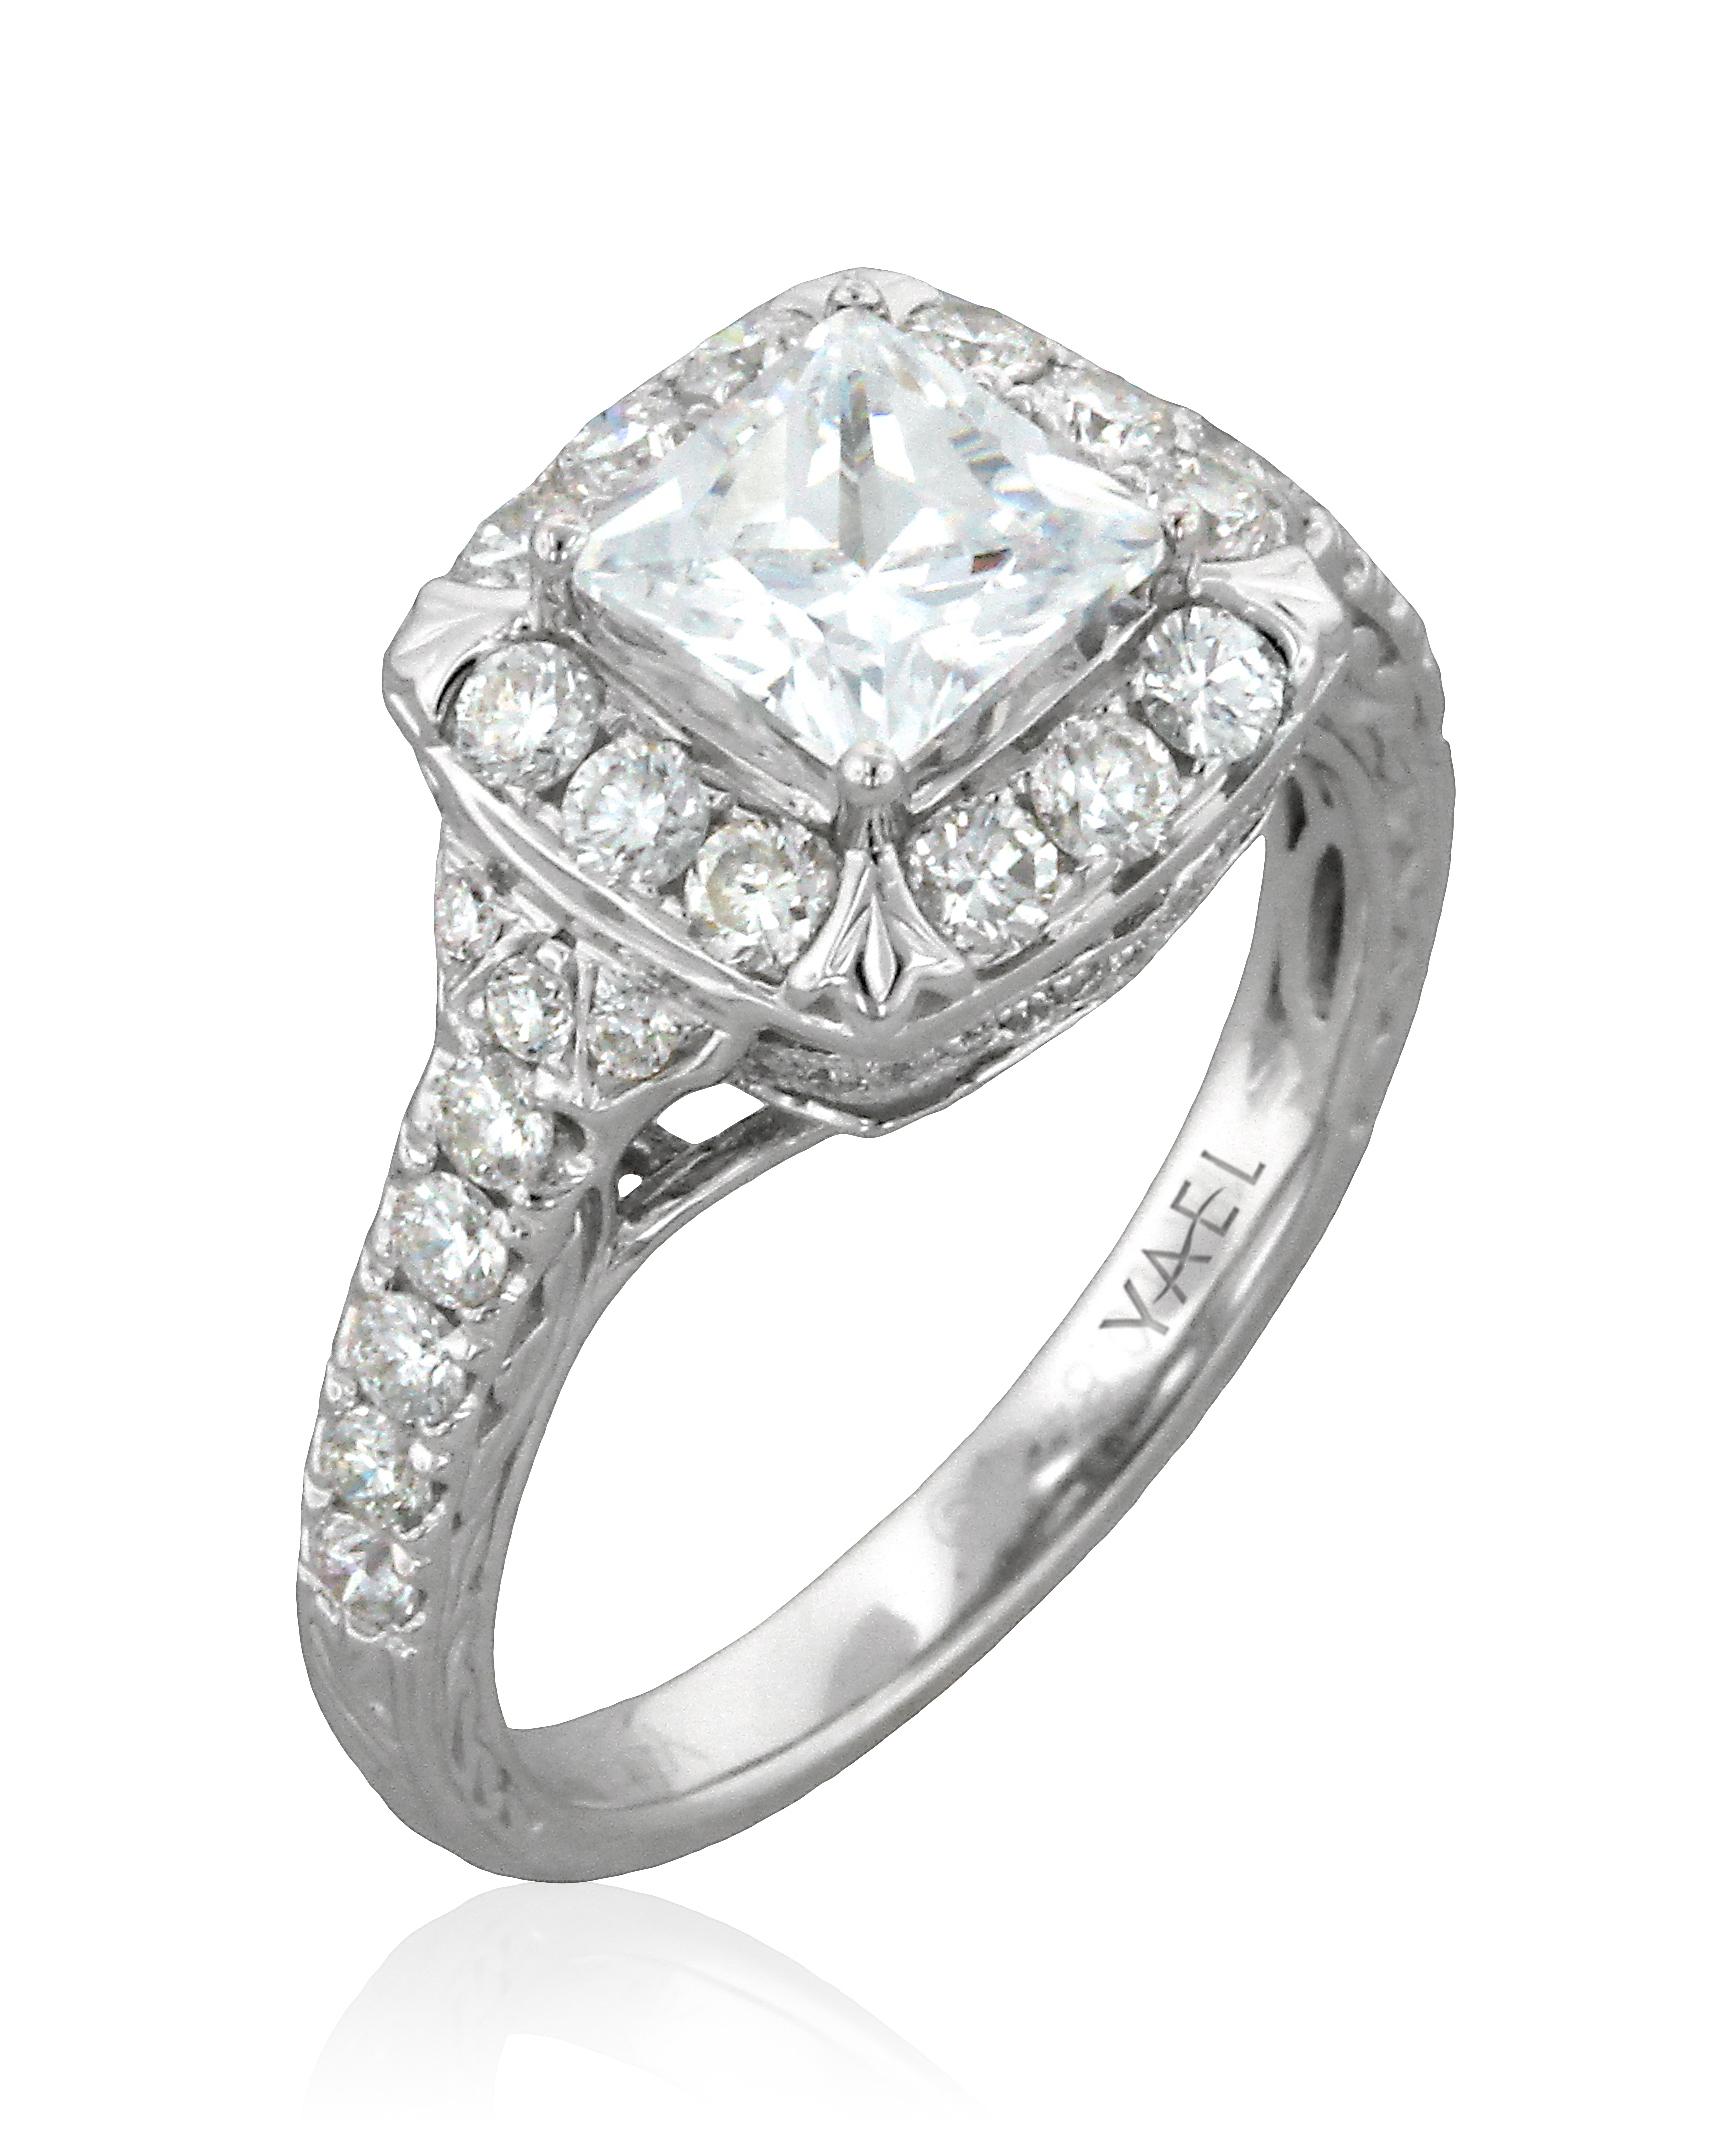 yael-designs-princess-cut-engagement-ring-two-0816.jpg